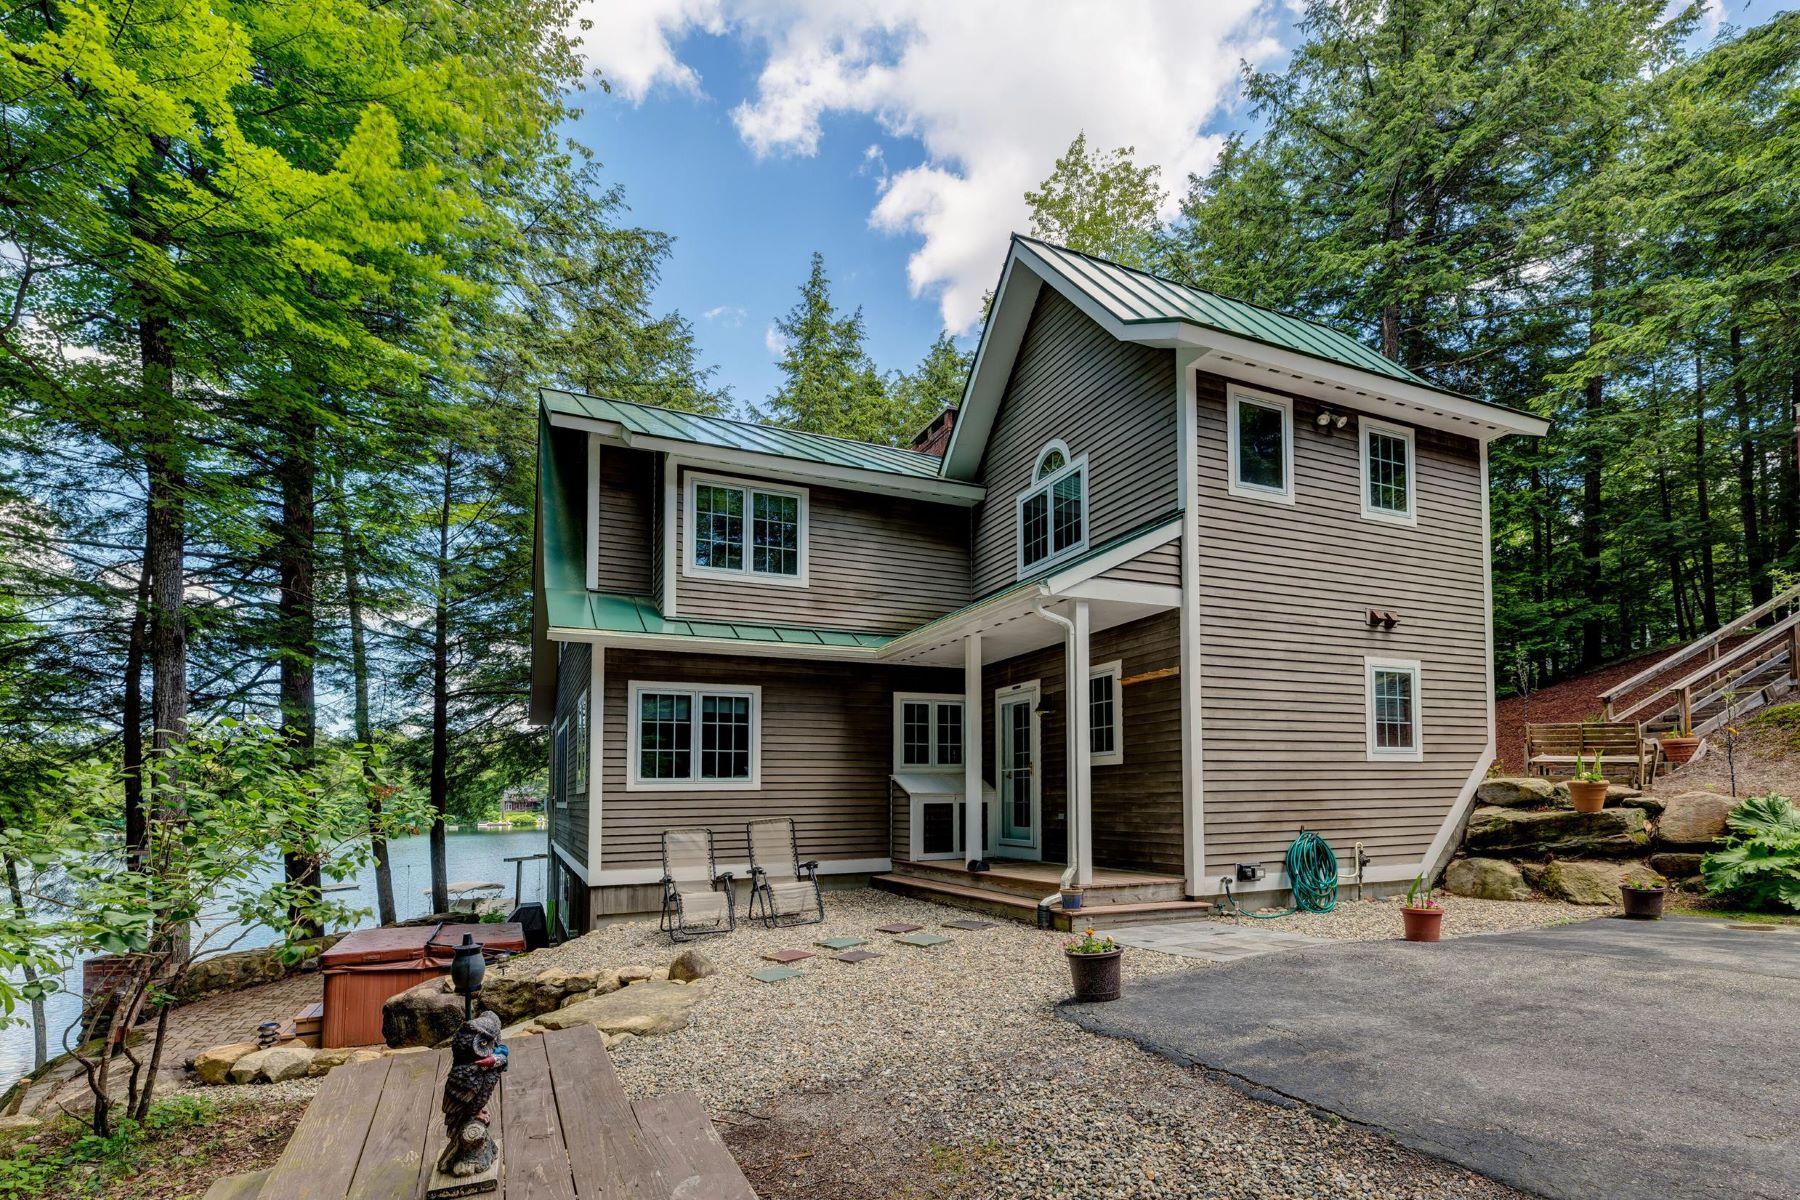 Single Family Homes для того Продажа на Lovely, Private Lakeside Home 62 Ridgewood Road Rd, Sunapee, Нью-Гэмпшир 03782 Соединенные Штаты